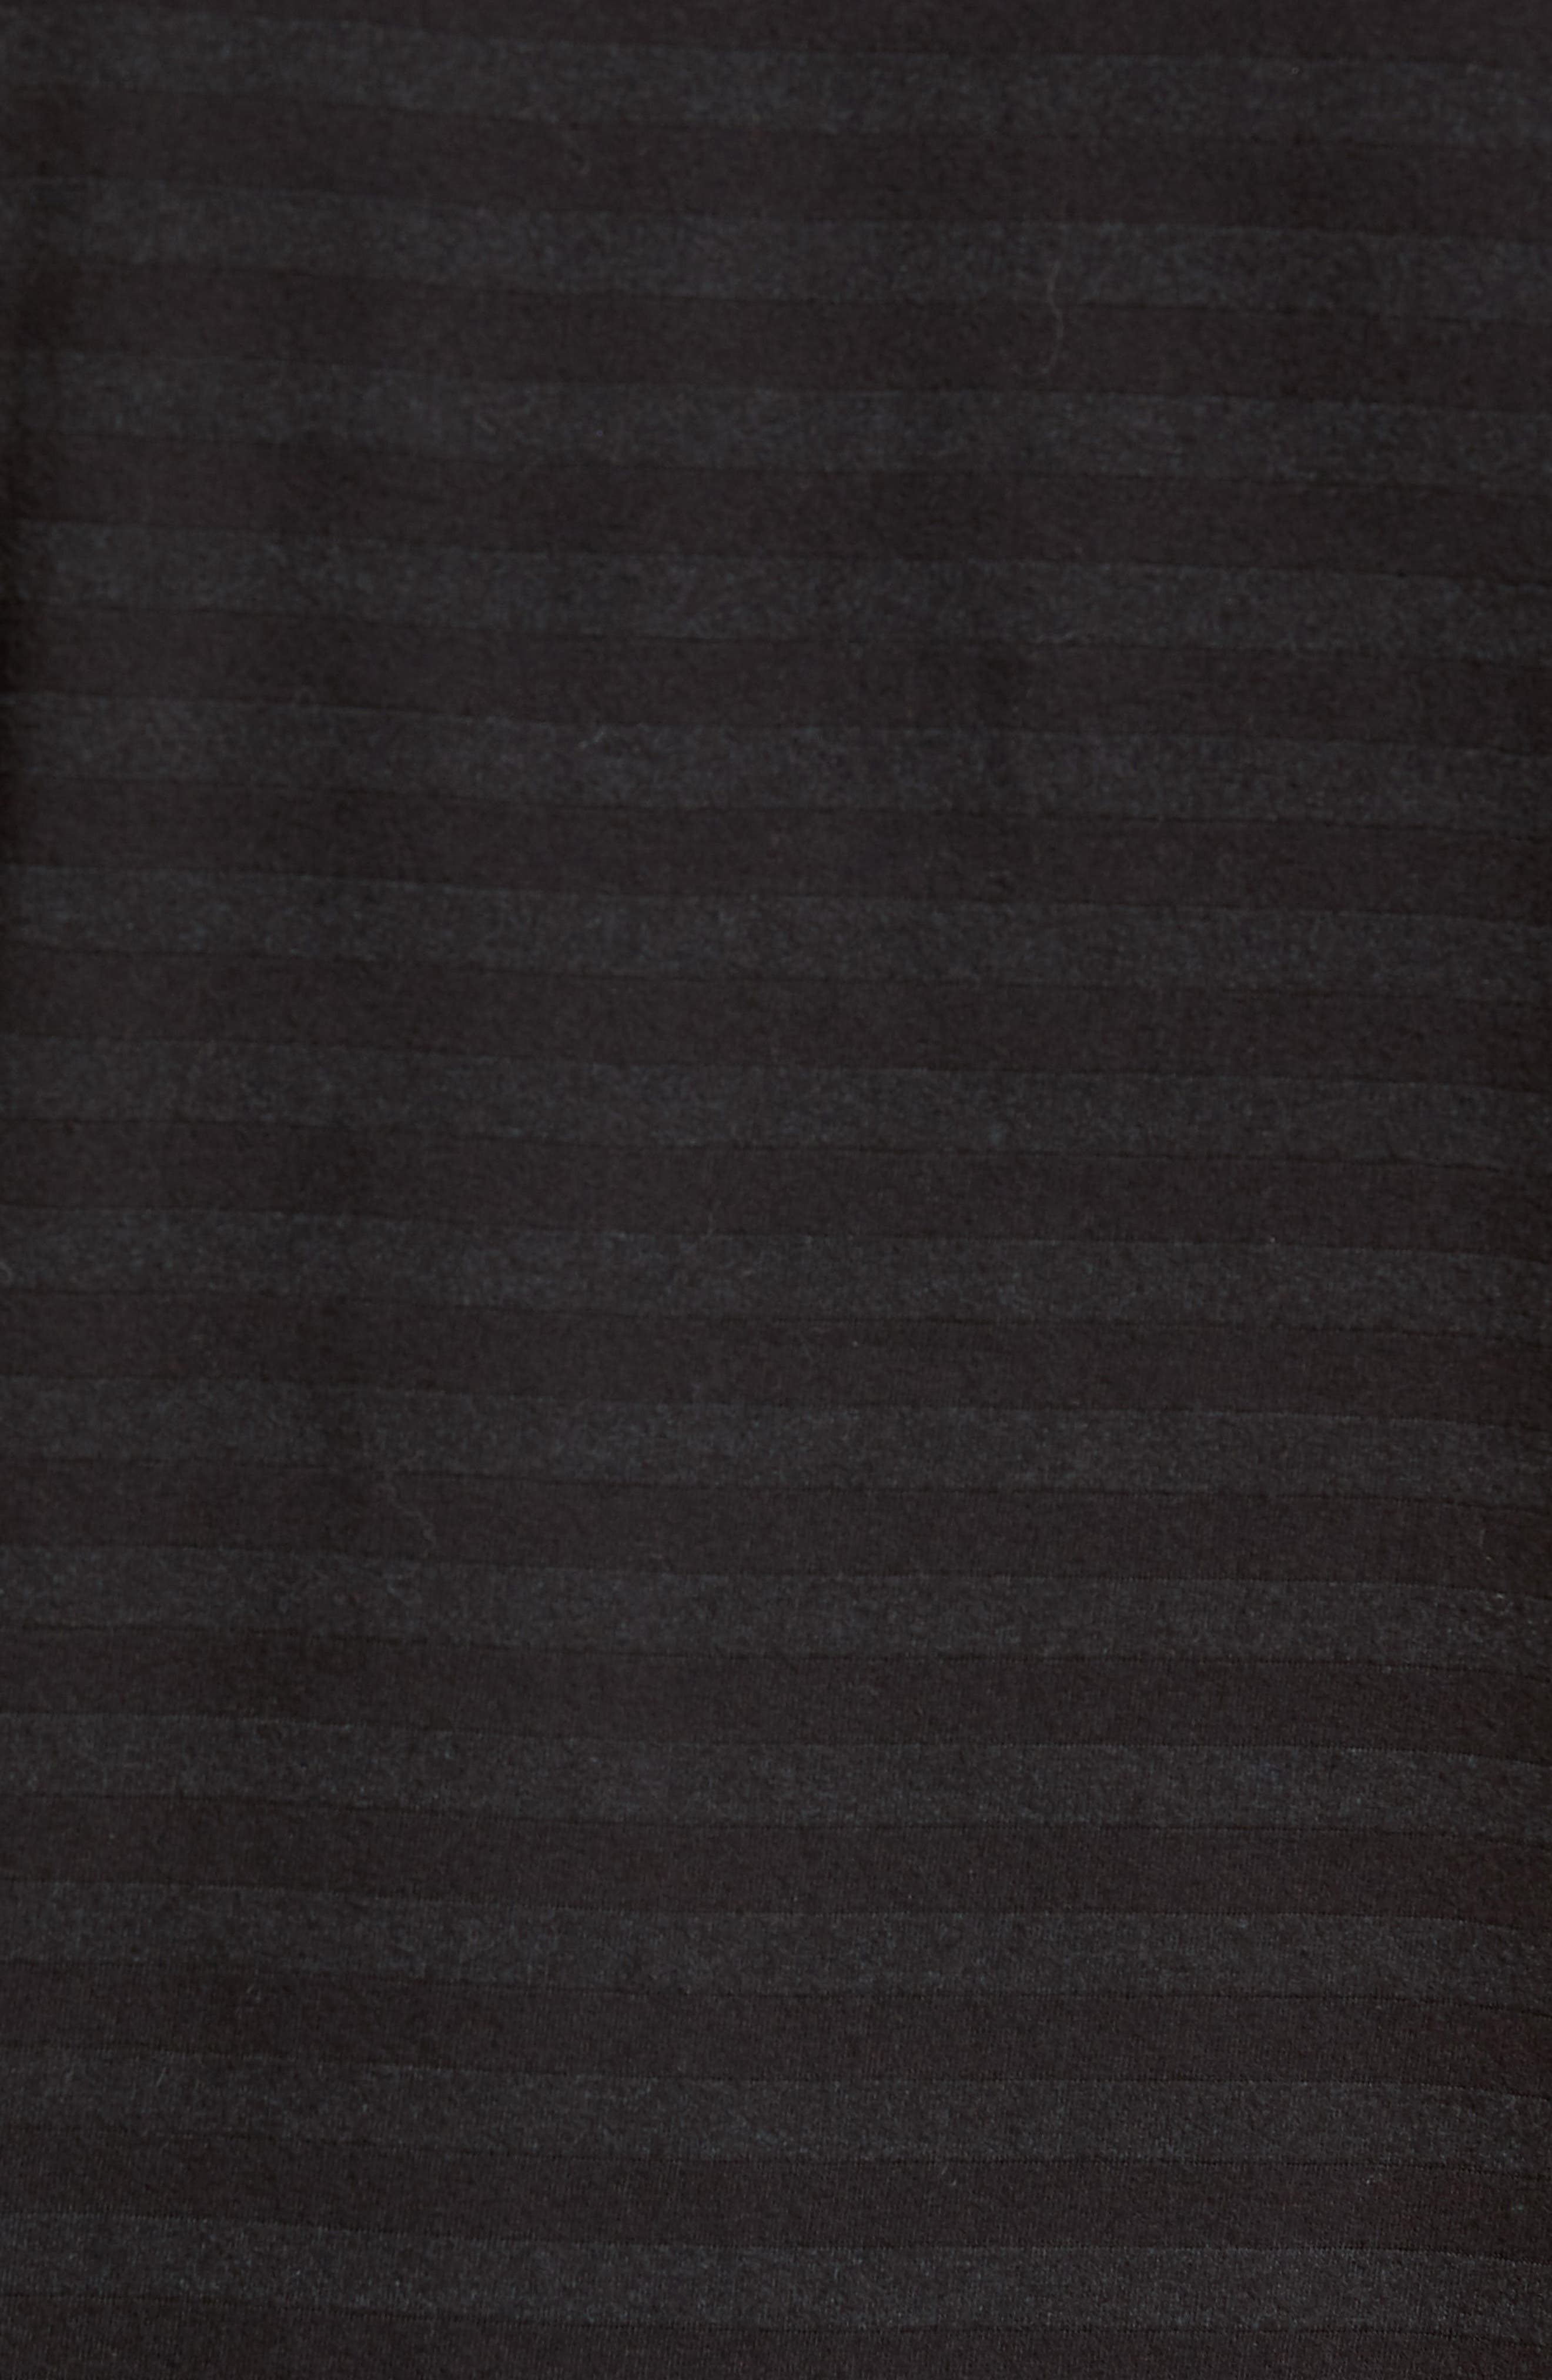 Shadow Stripe Pocket T-Shirt,                             Alternate thumbnail 5, color,                             020